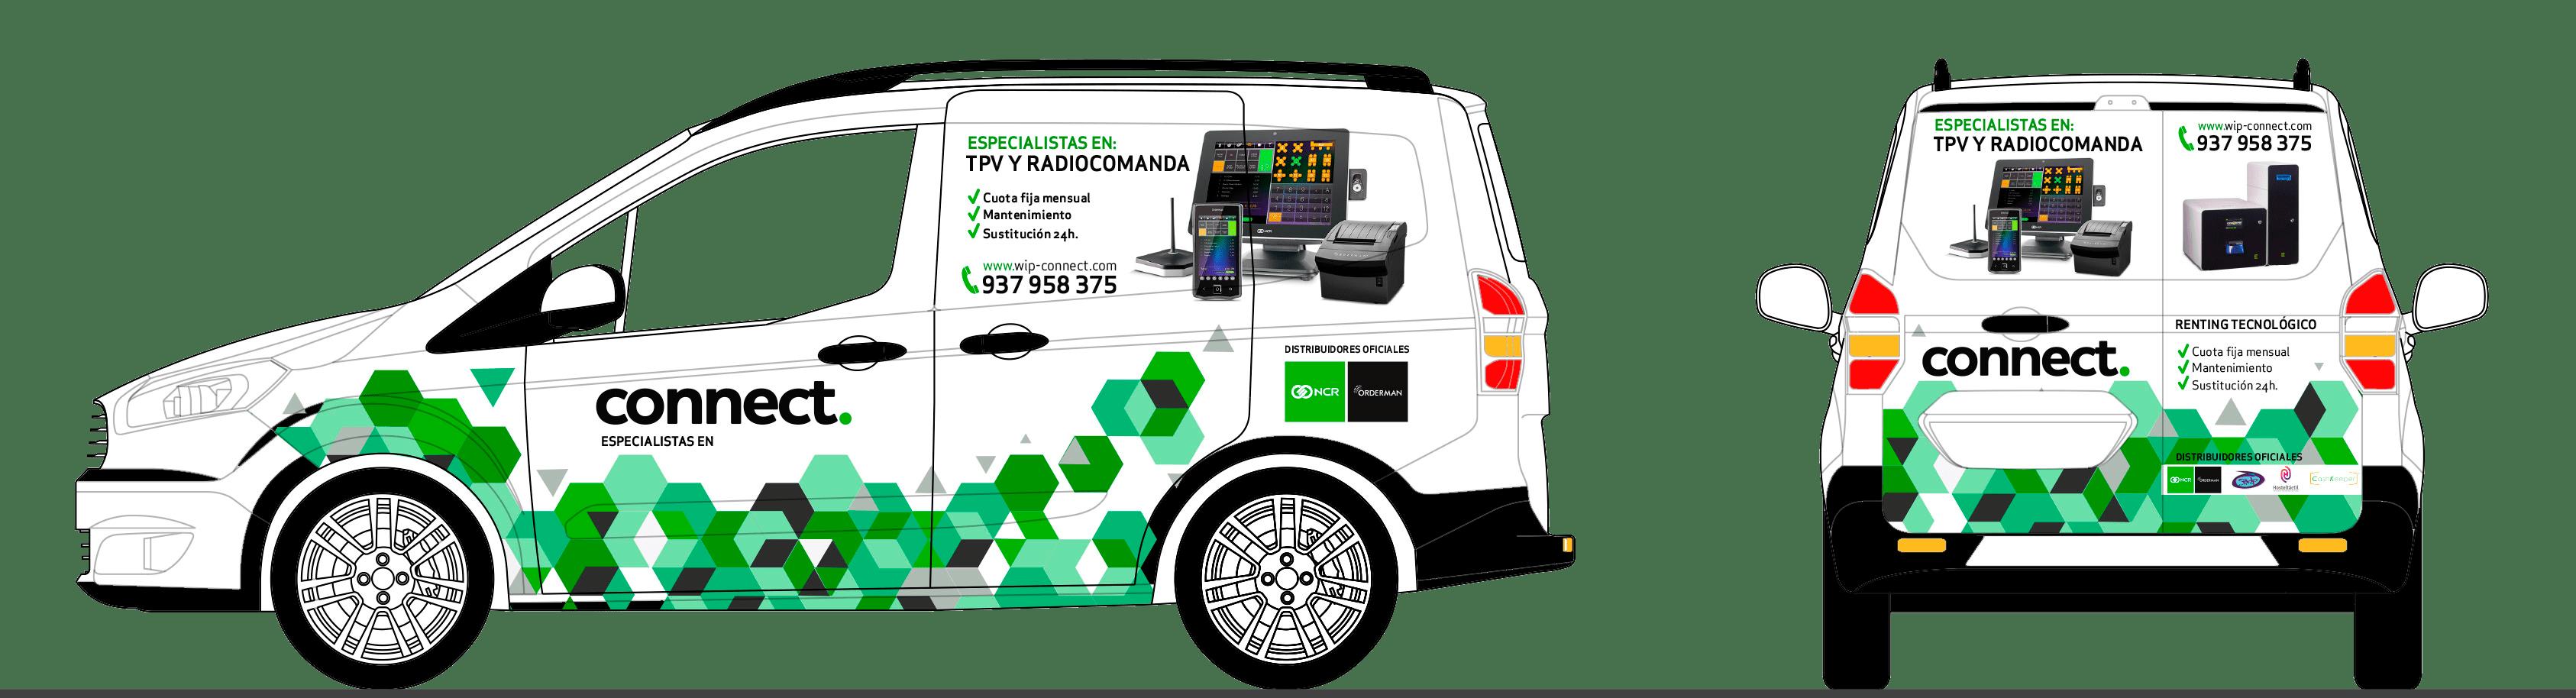 furgoneta-connect-2-min